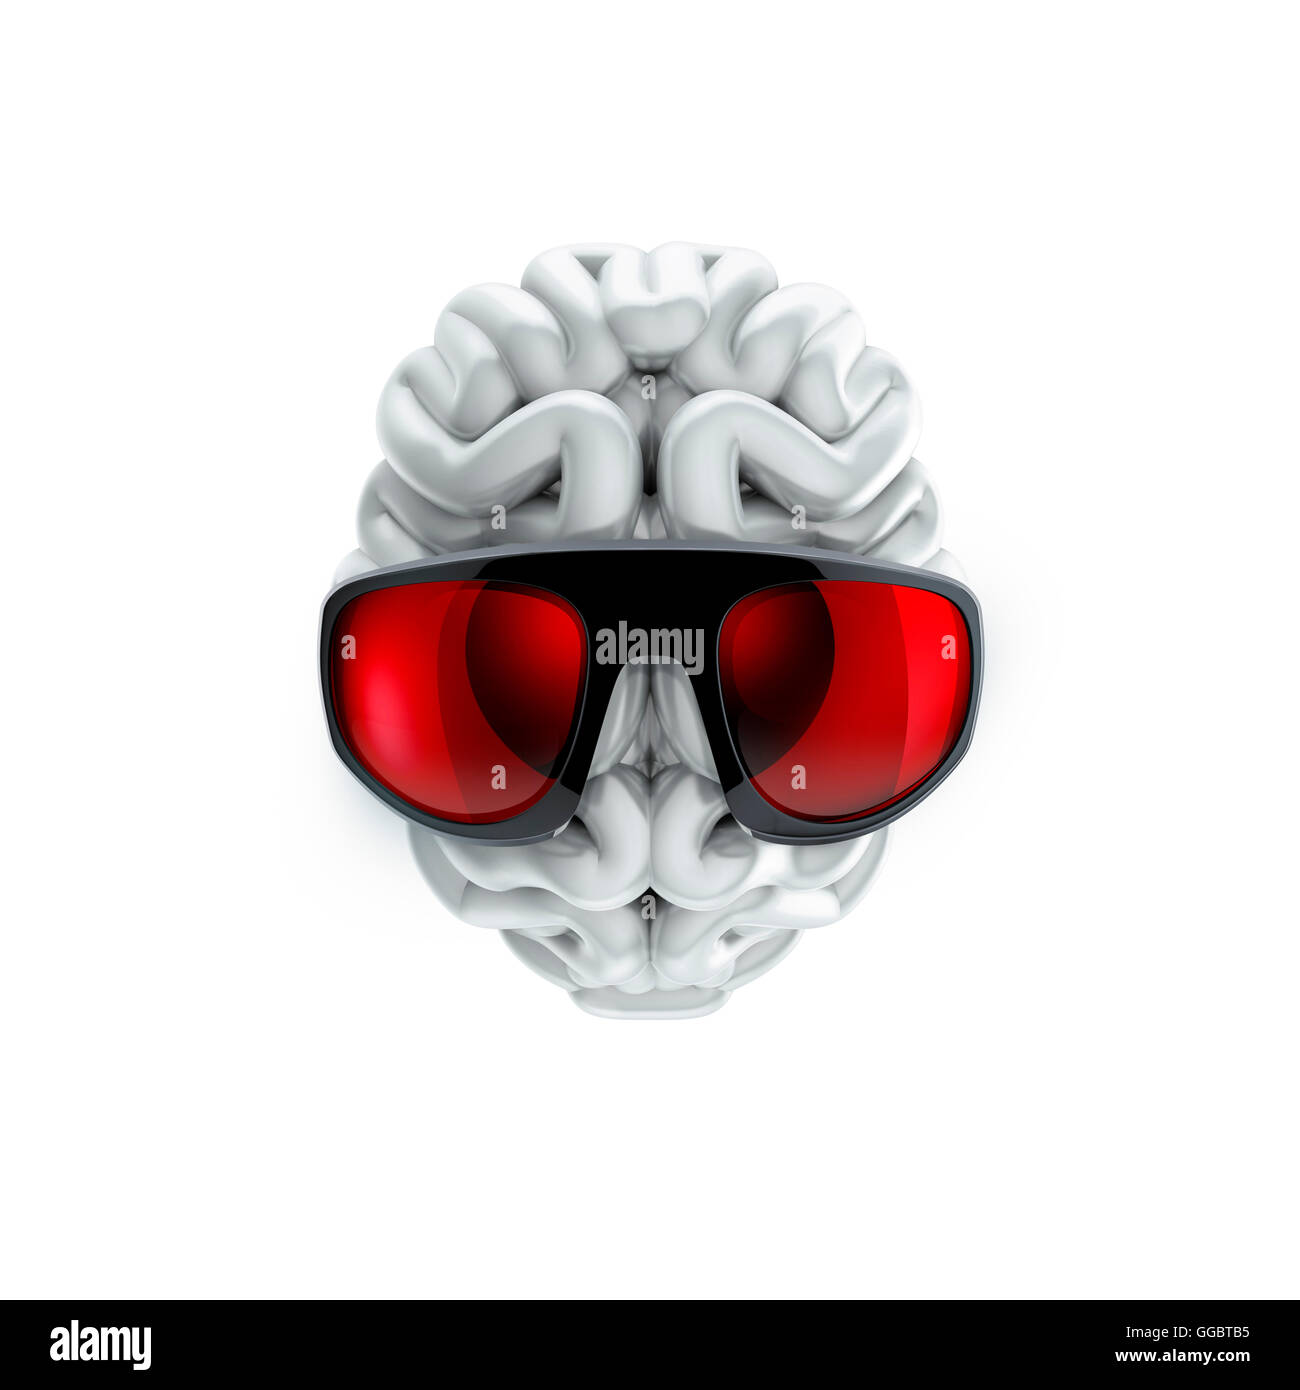 Sunglasses on brain / 3D illustration of human brain wearing sunglasses - Stock Image